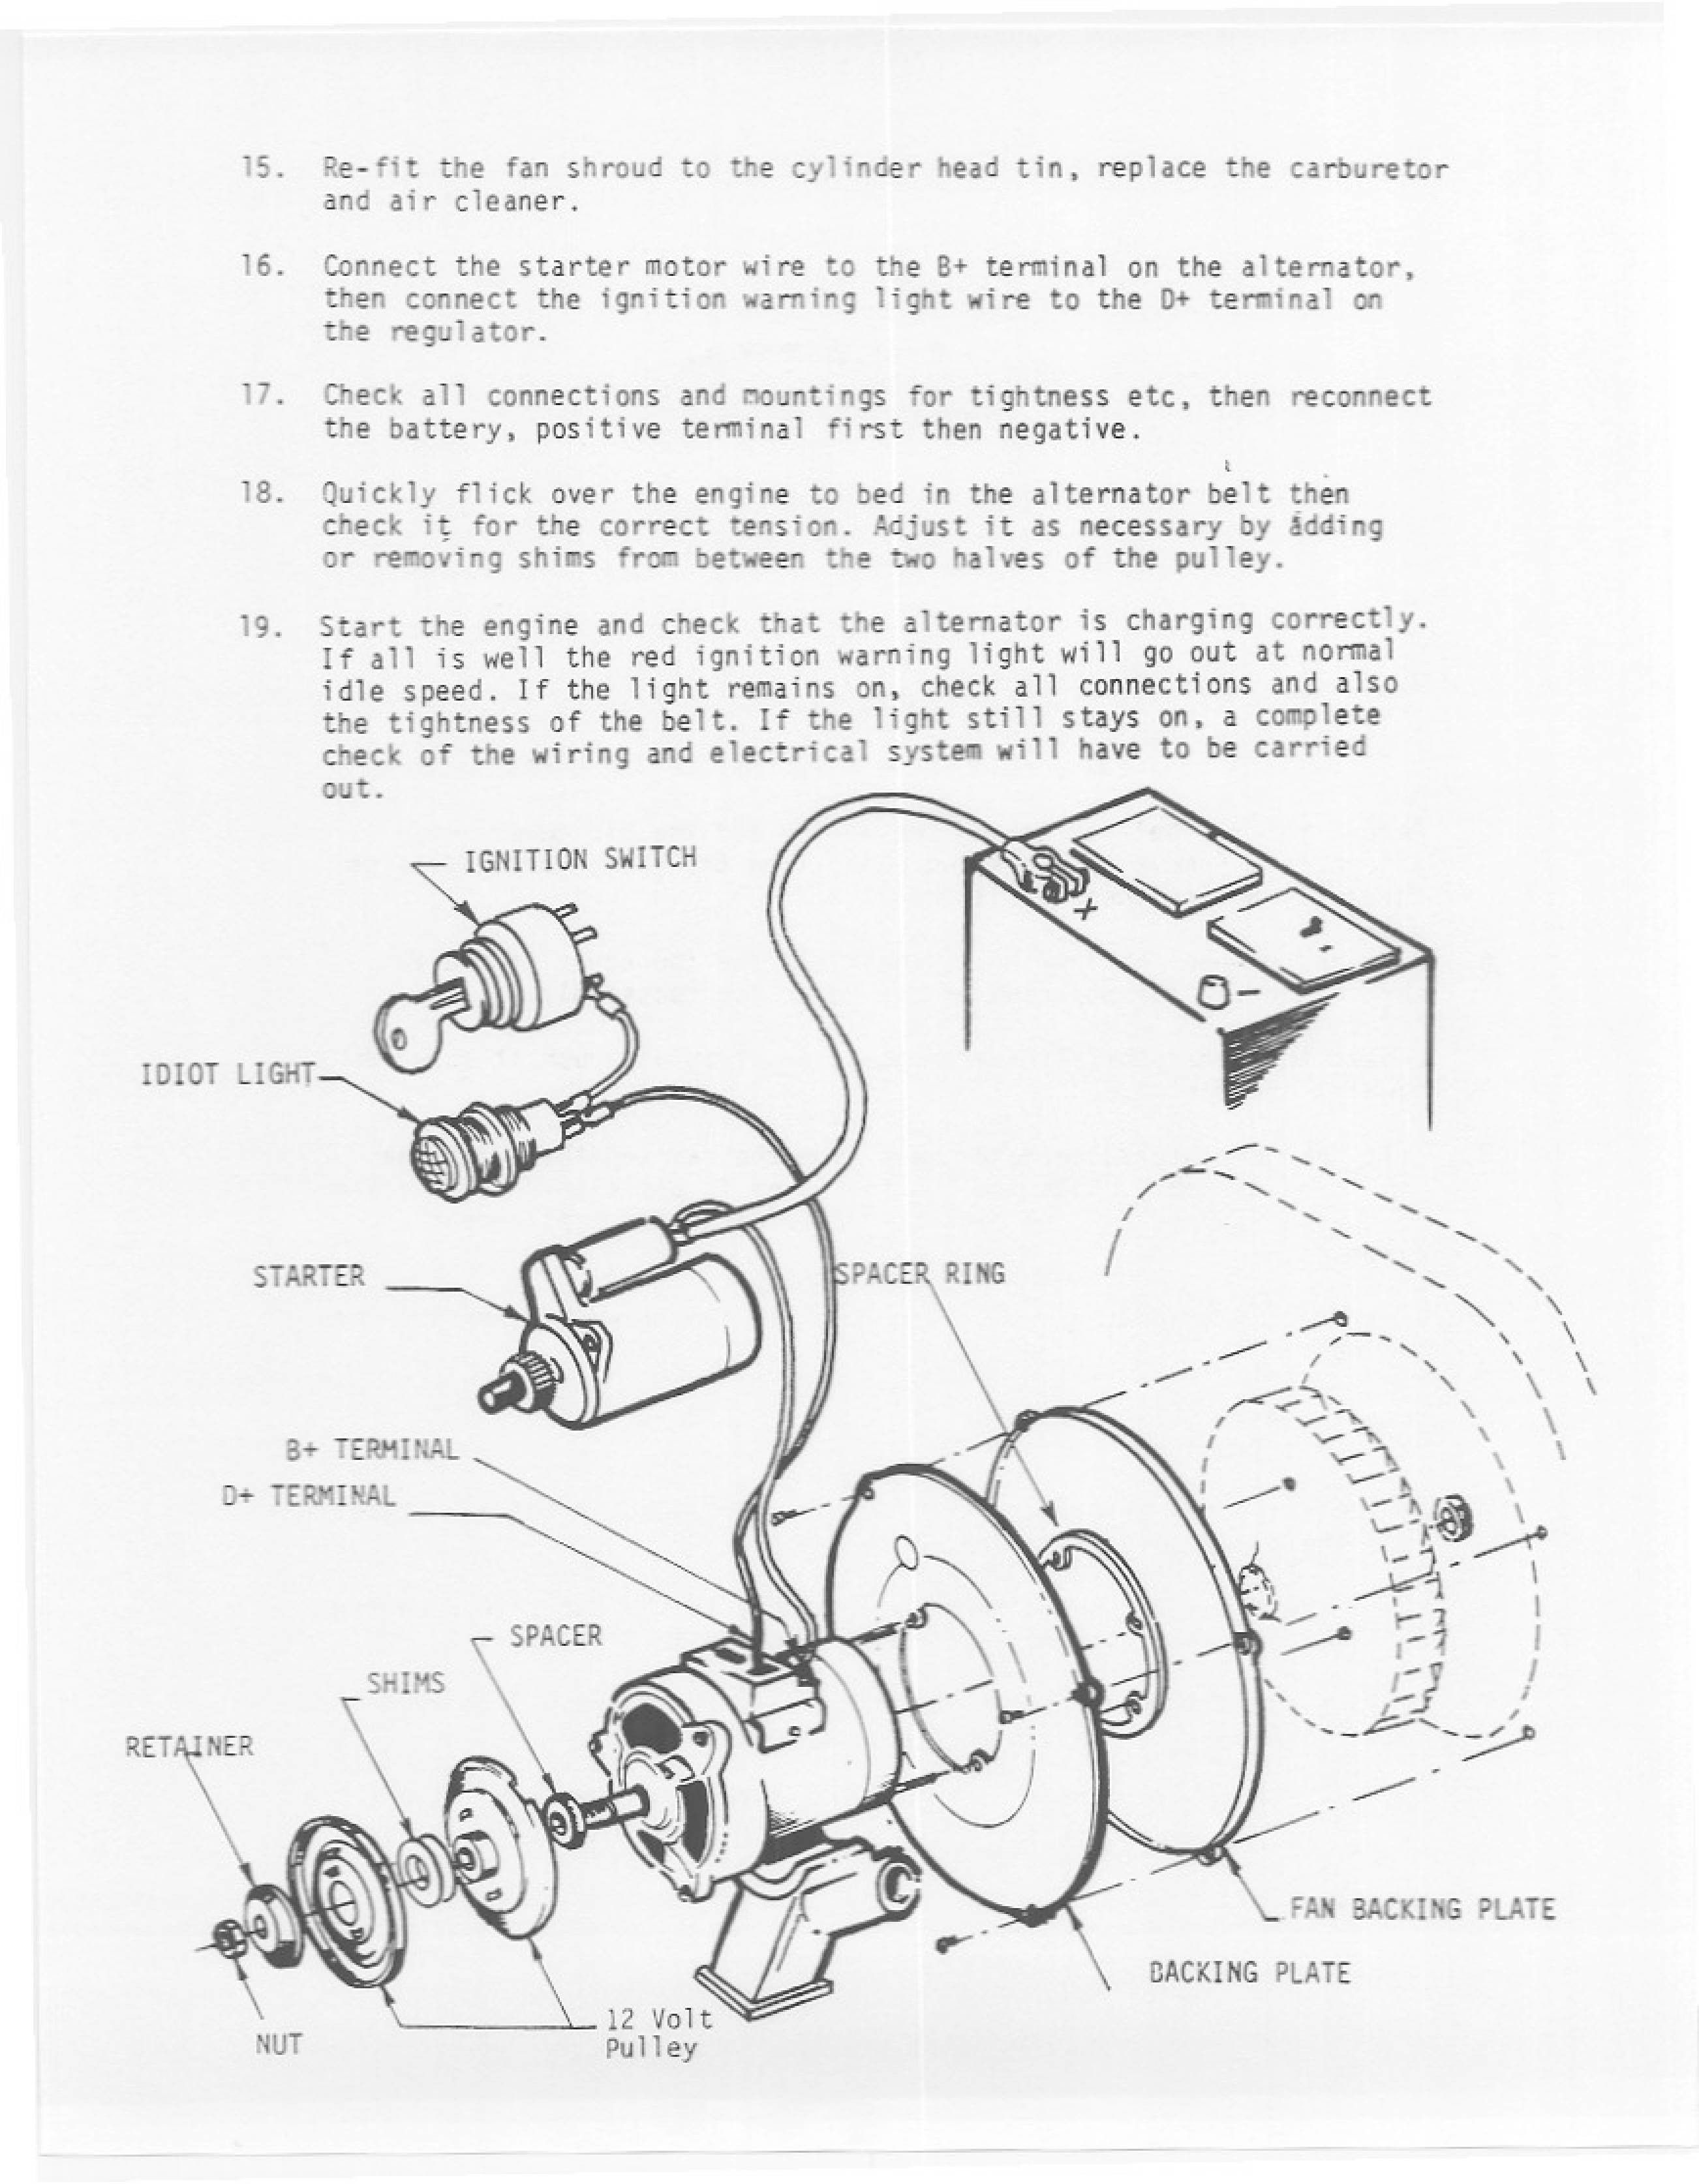 Inspirational Brush Alternator Wiring Diagram Diagrams Digramssample Diagramimages Wiringdiagramsample Alternator Warning Lights Electrical Wiring Diagram